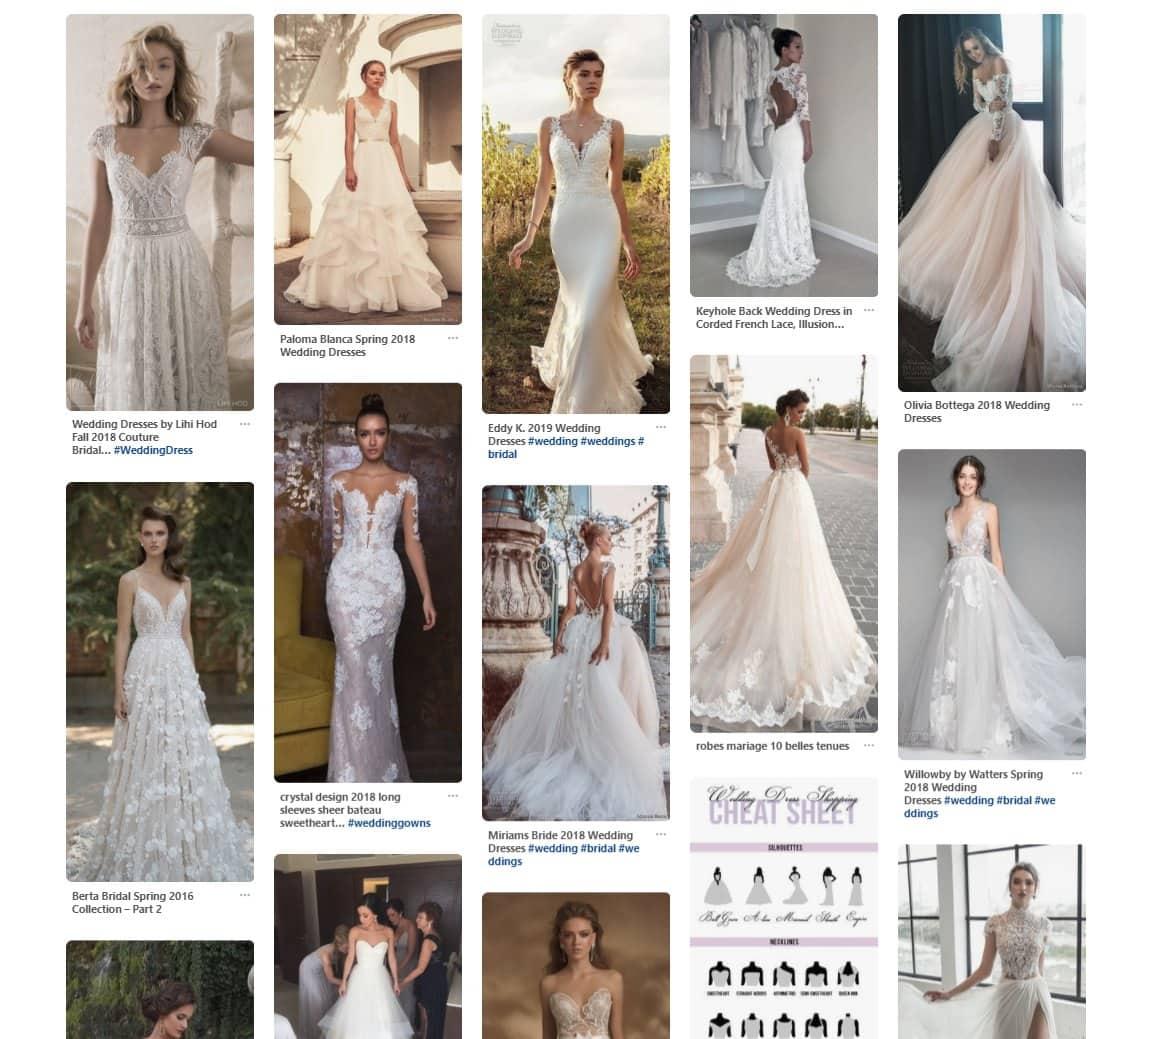 Wedding dresses inspiration - replace it